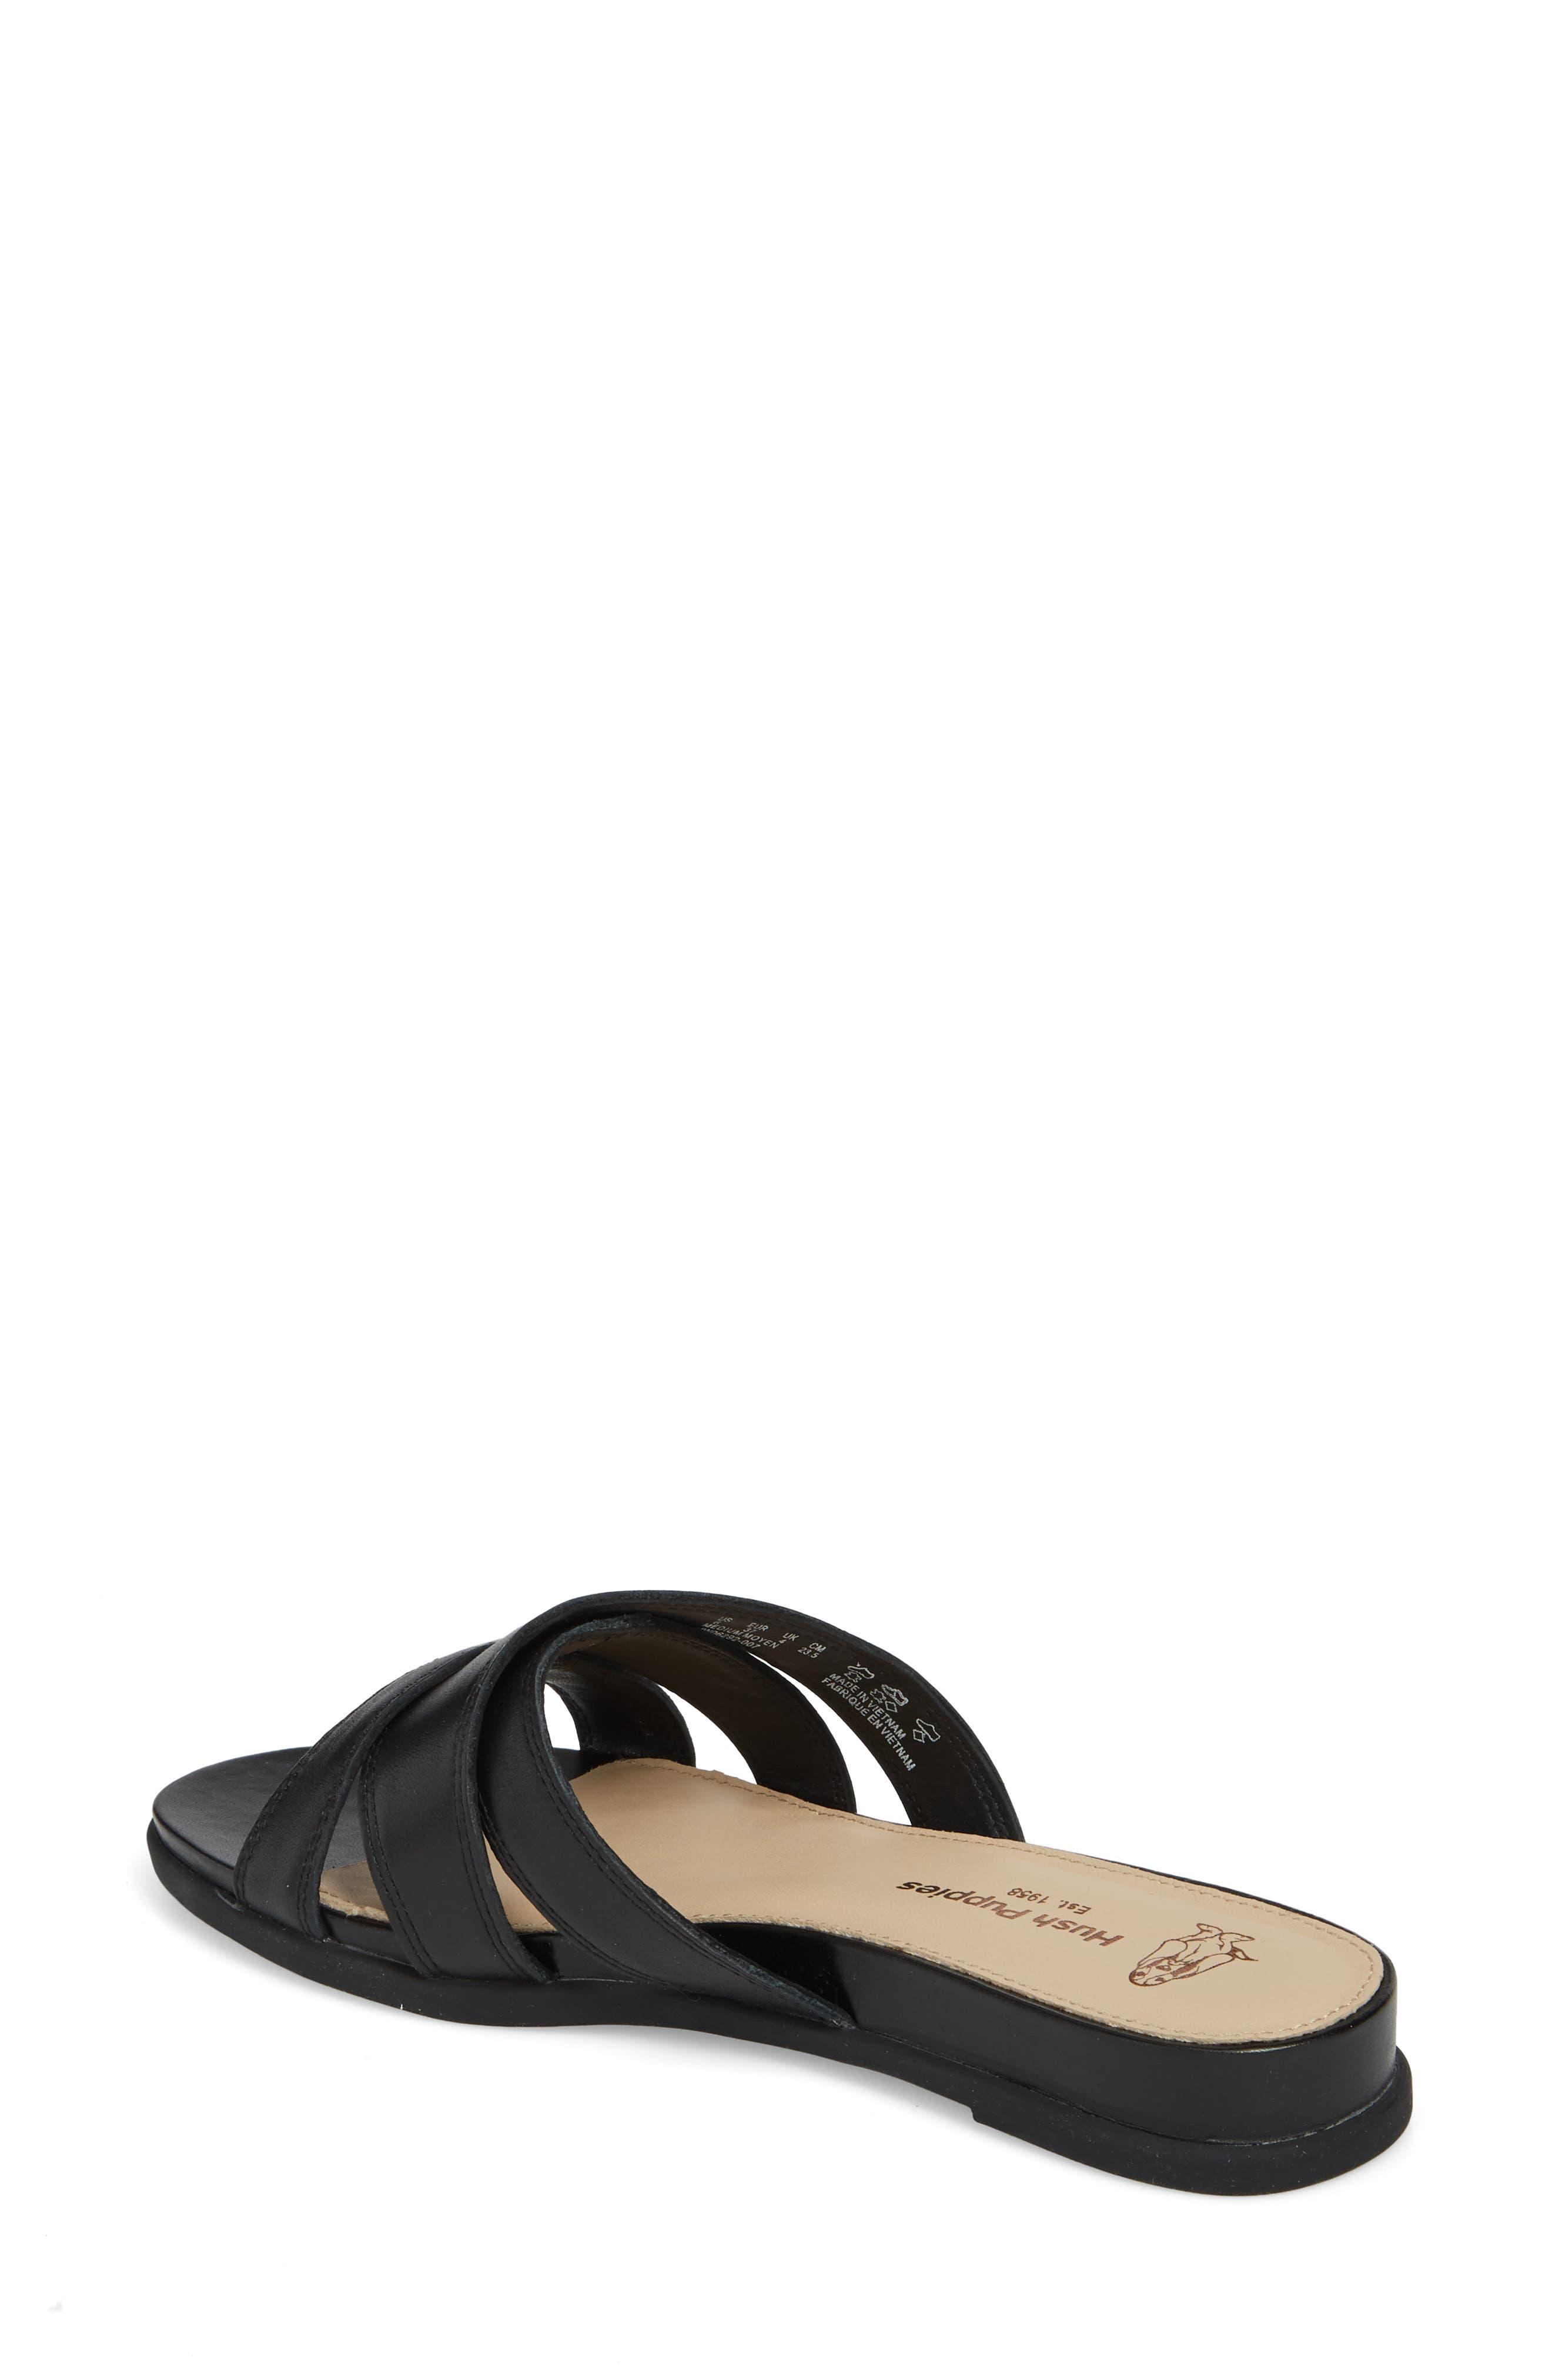 Dalmatian Slide Sandal,                             Alternate thumbnail 2, color,                             007